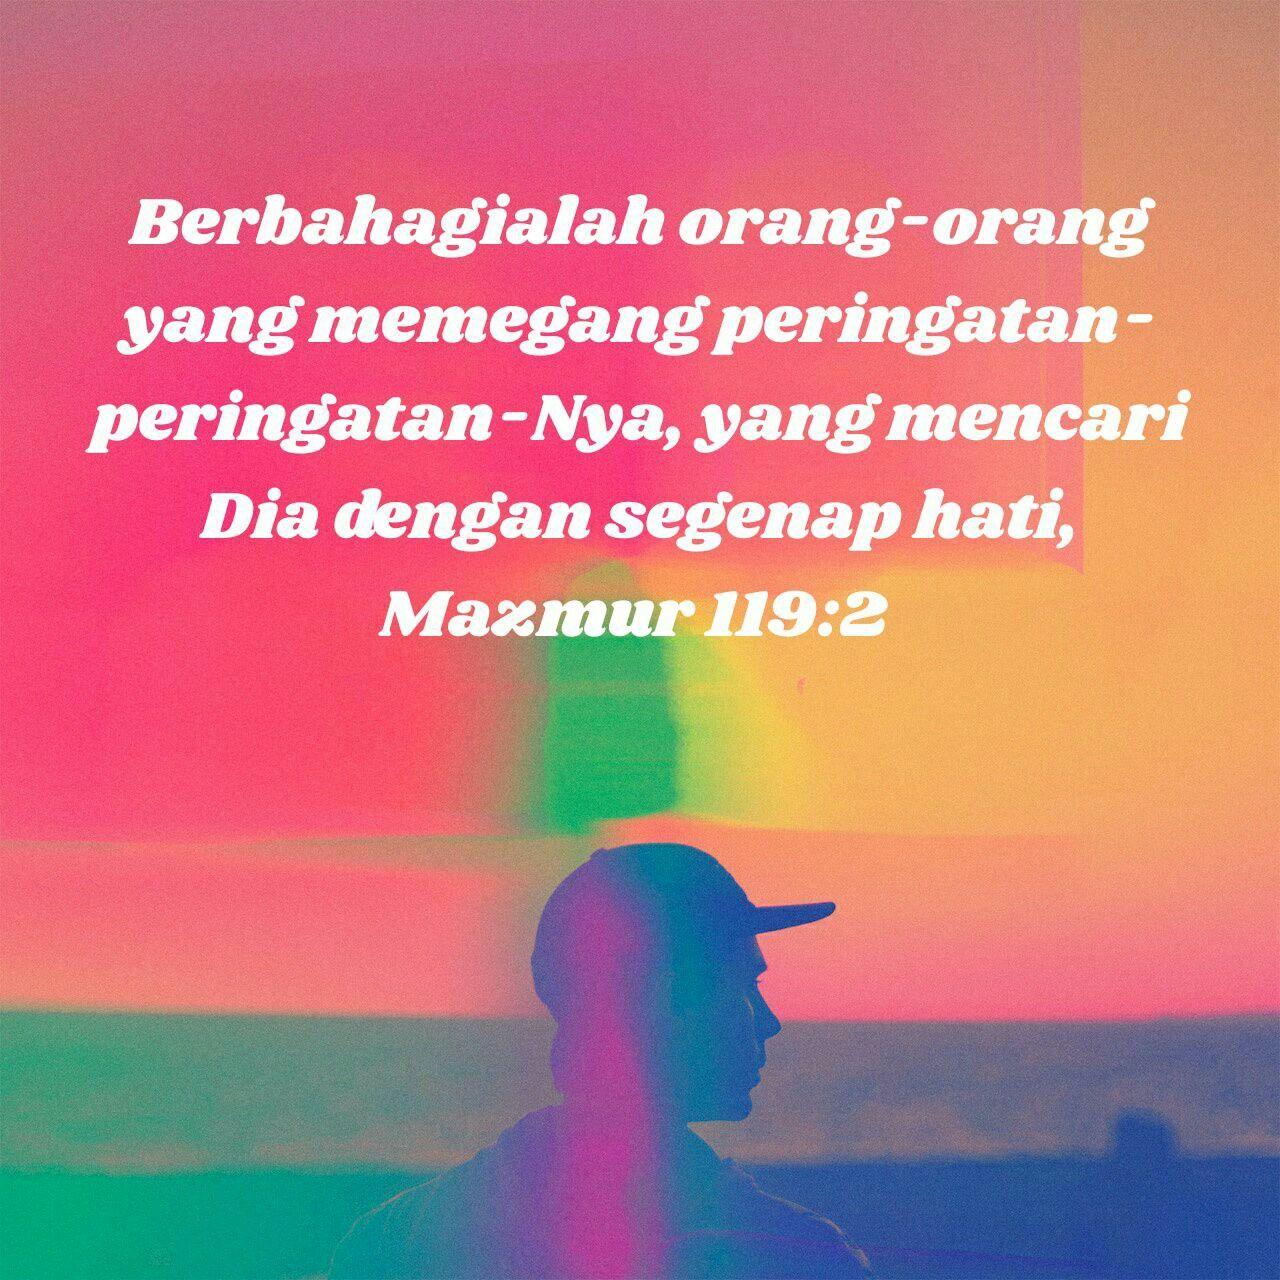 Mazmur 119 2 Incoming Call Screenshot Incoming Call Call Screenshot